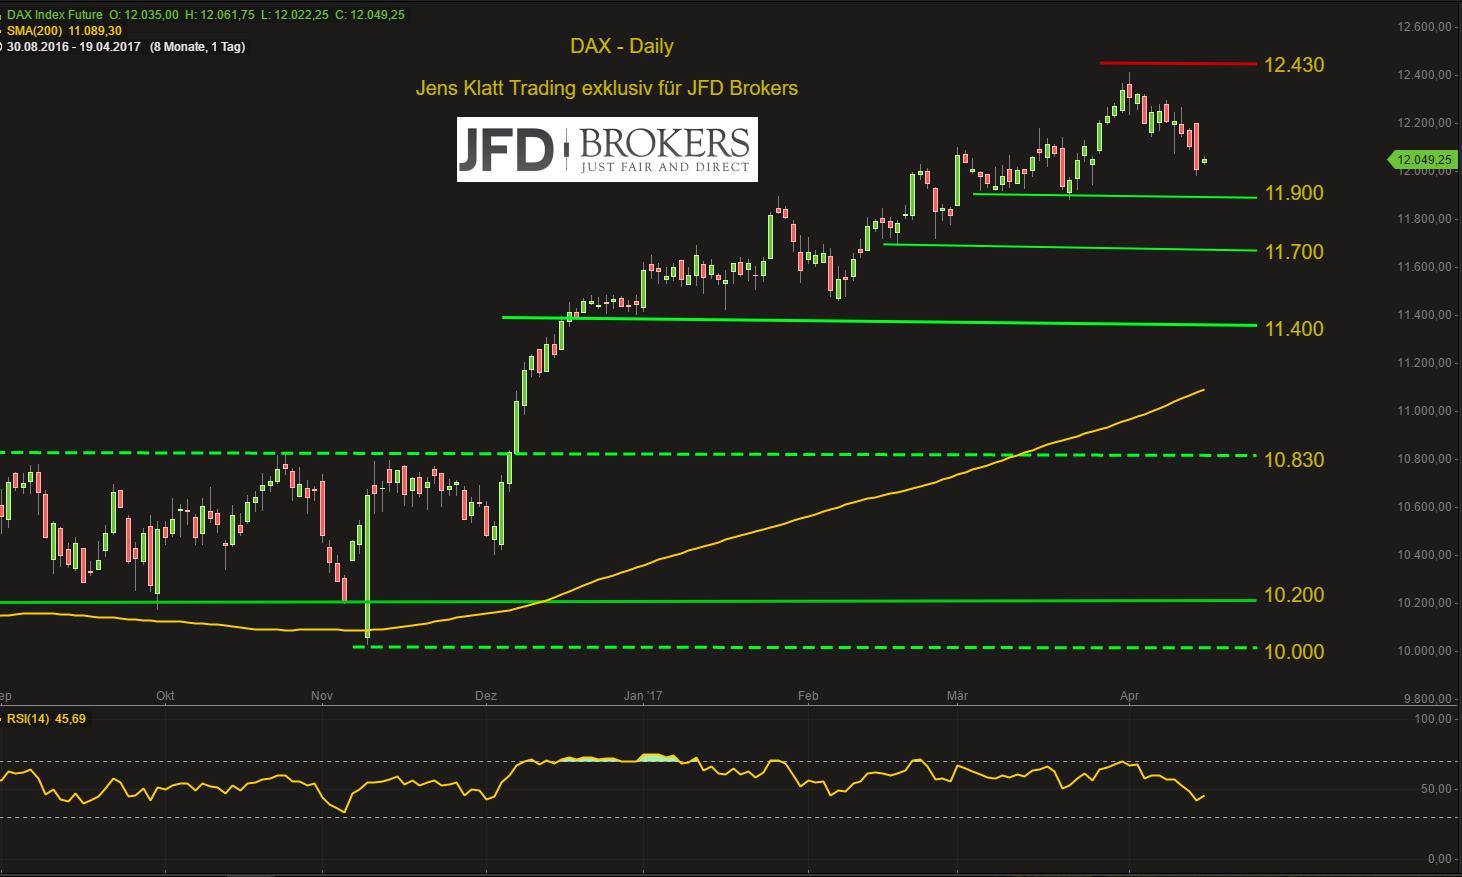 DAX-am-Mittwoch-ruhig-die-Ruhe-vor-dem-Sturm-Kommentar-JFD-Brokers-GodmodeTrader.de-2